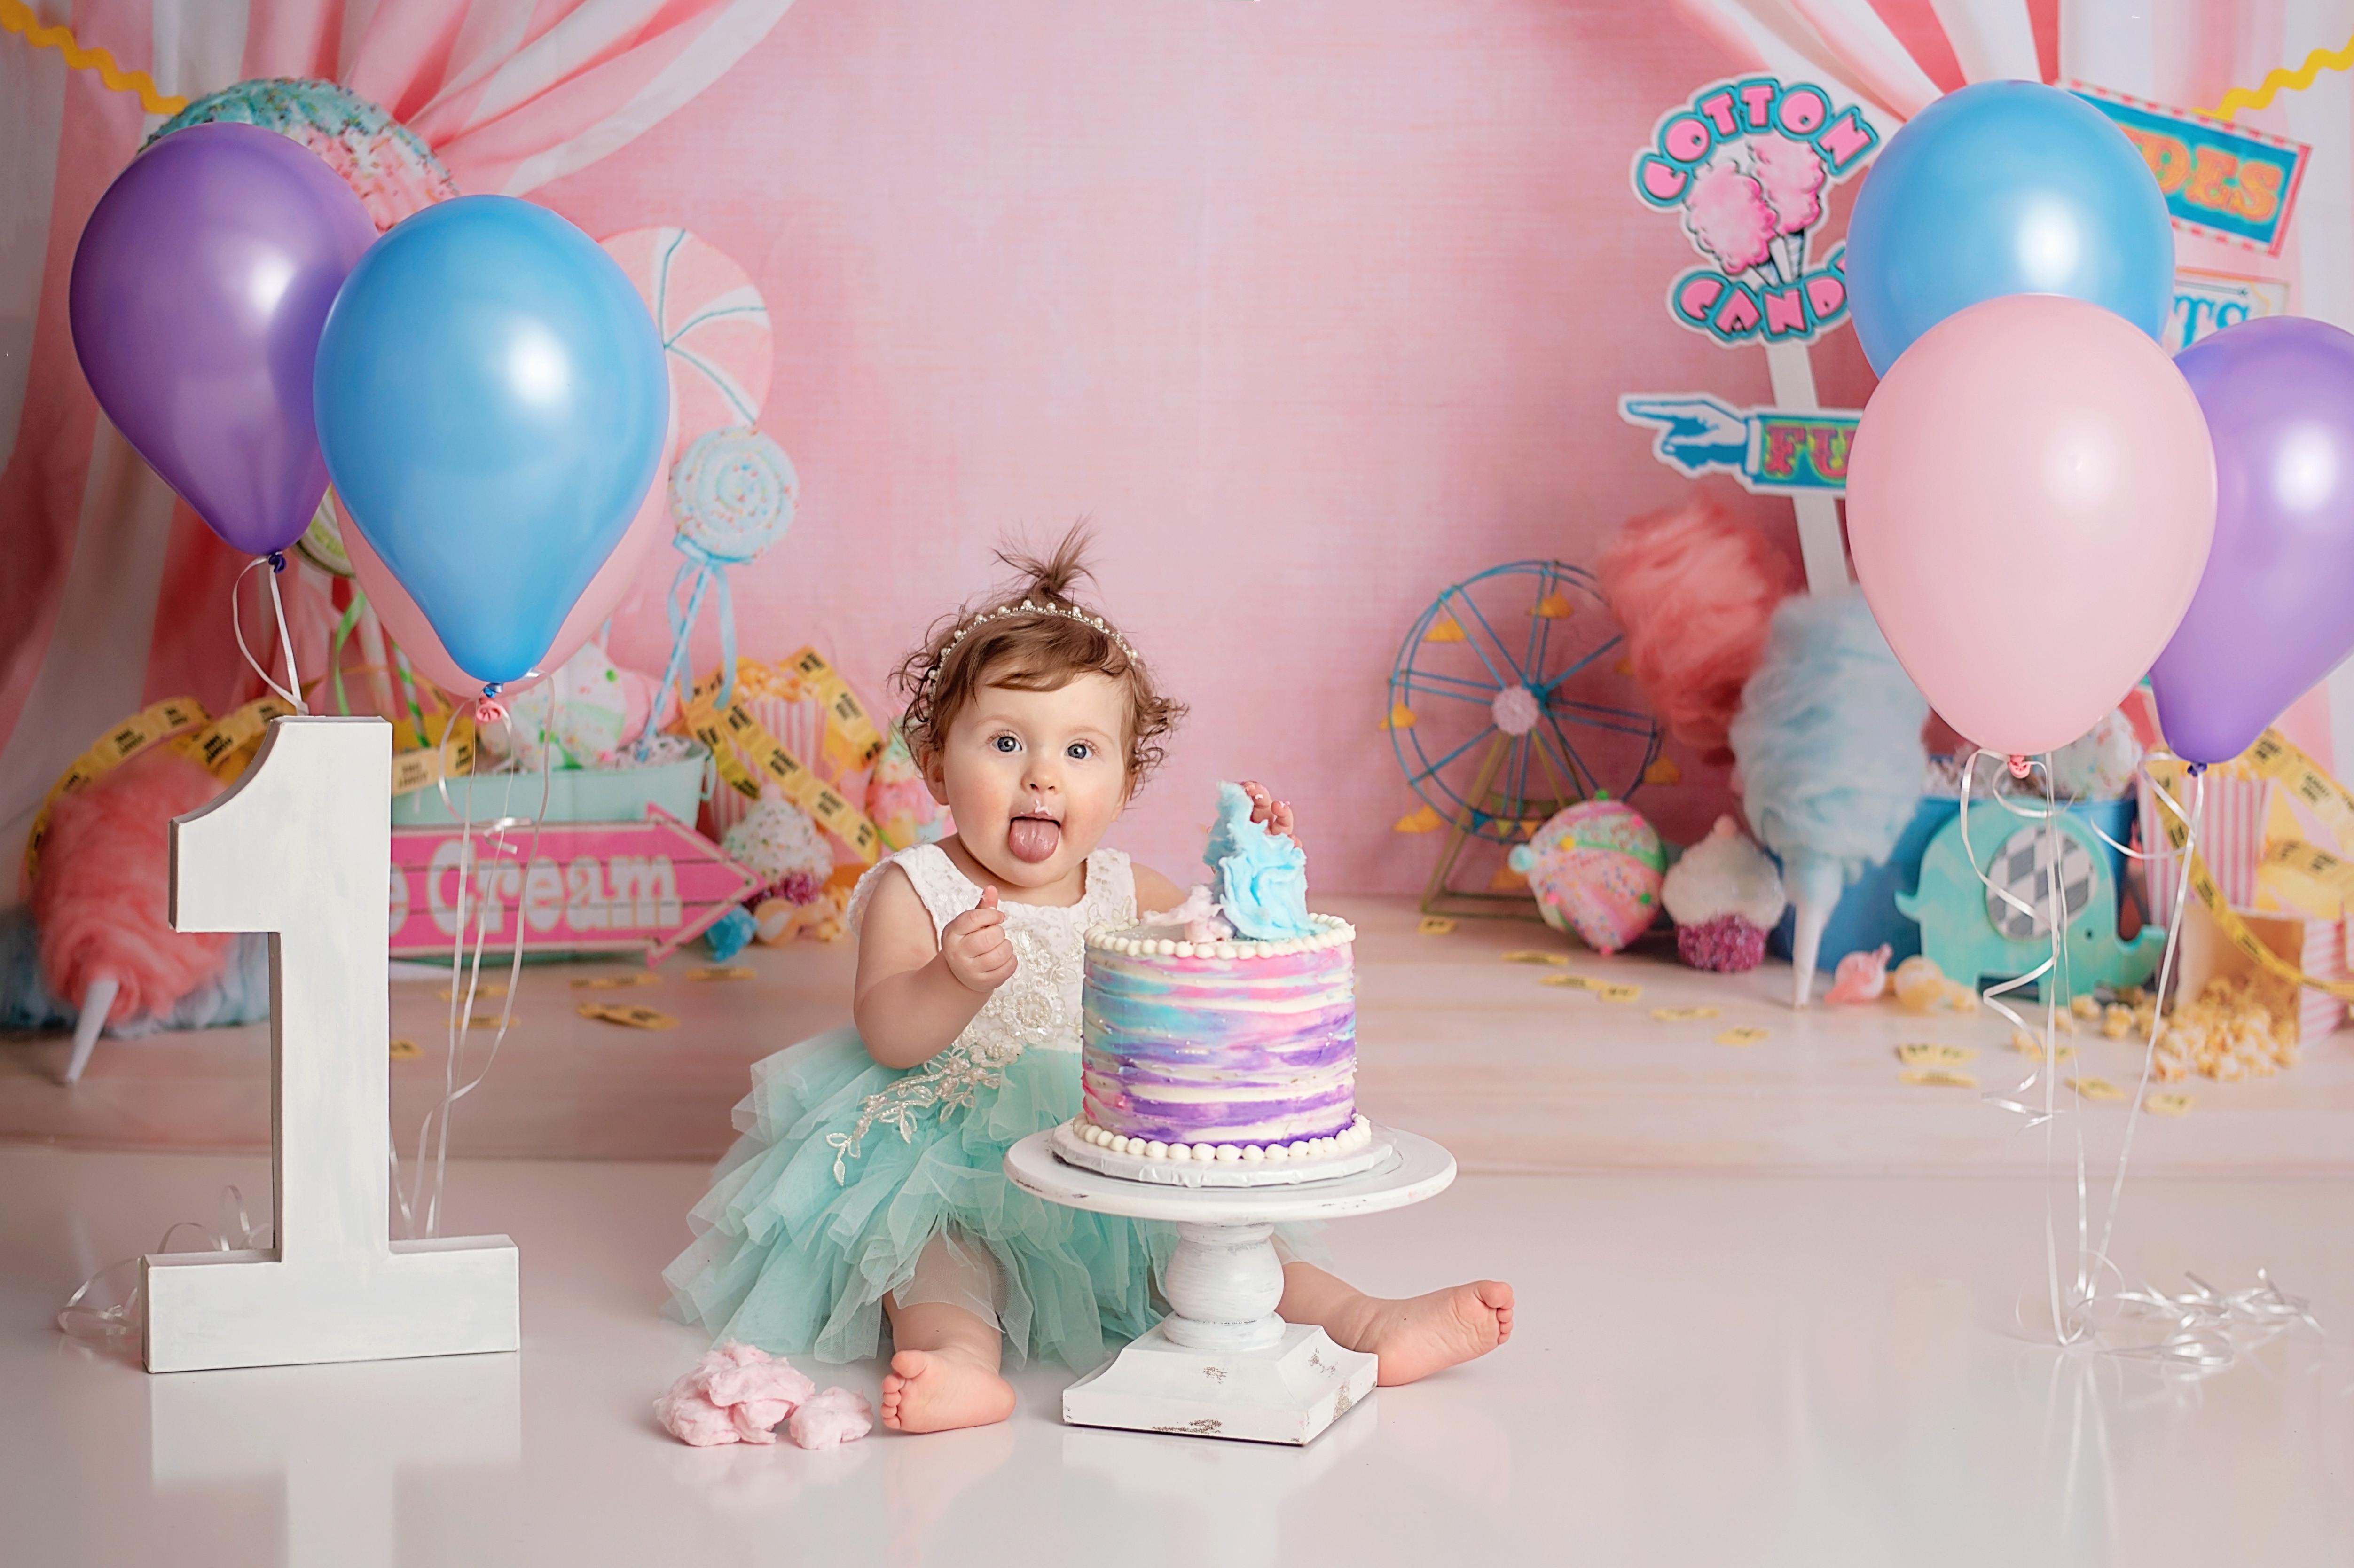 Cake Smash / Birthday Session